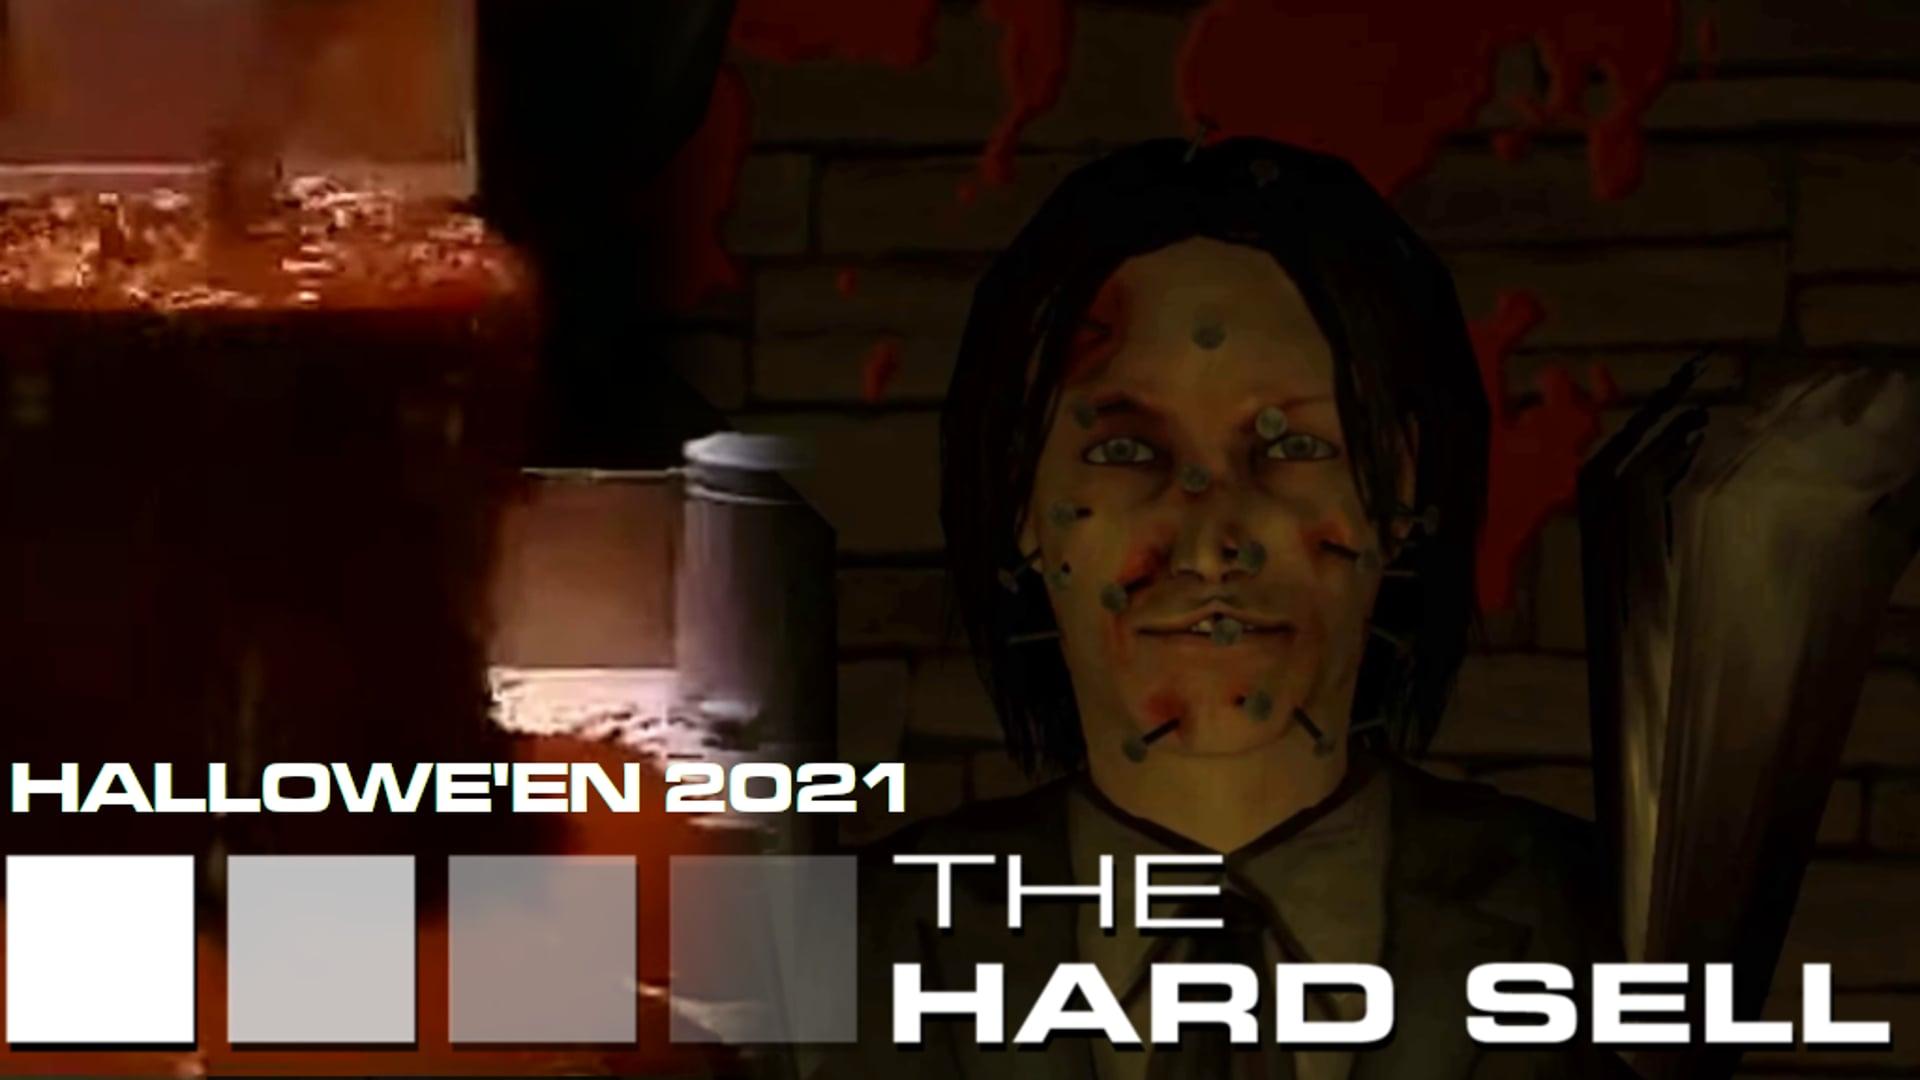 The Hard Sell #154 - Hallowe'en 2021